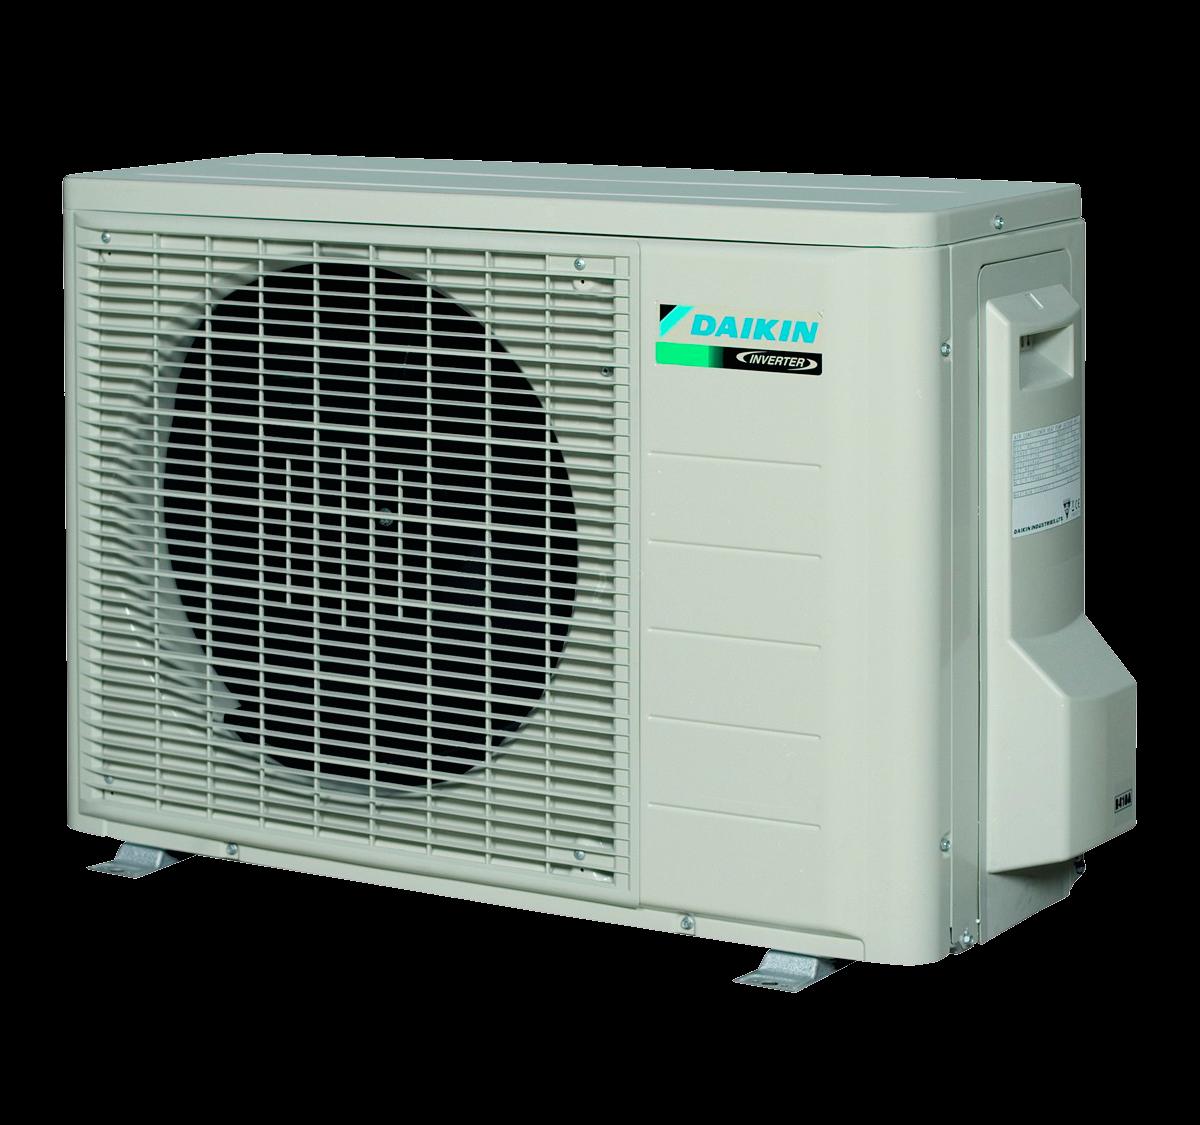 aire acondicionado unidad exterior daikin inverter bluevolution rxp35m modelo comfora txp60m instalacion incluida caseragua